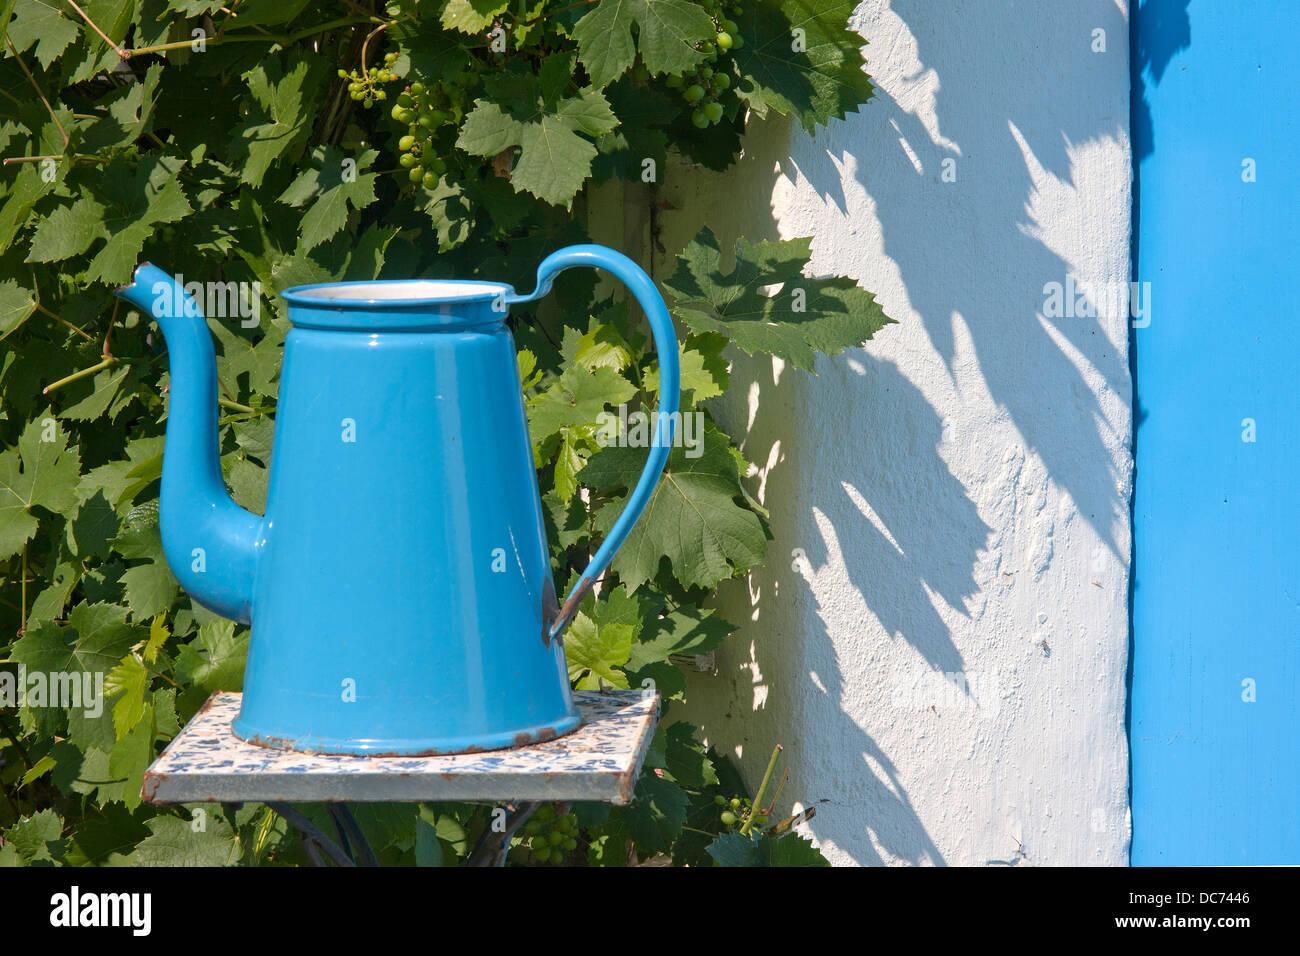 Madam blue enameledl coffee pot - Stock Image